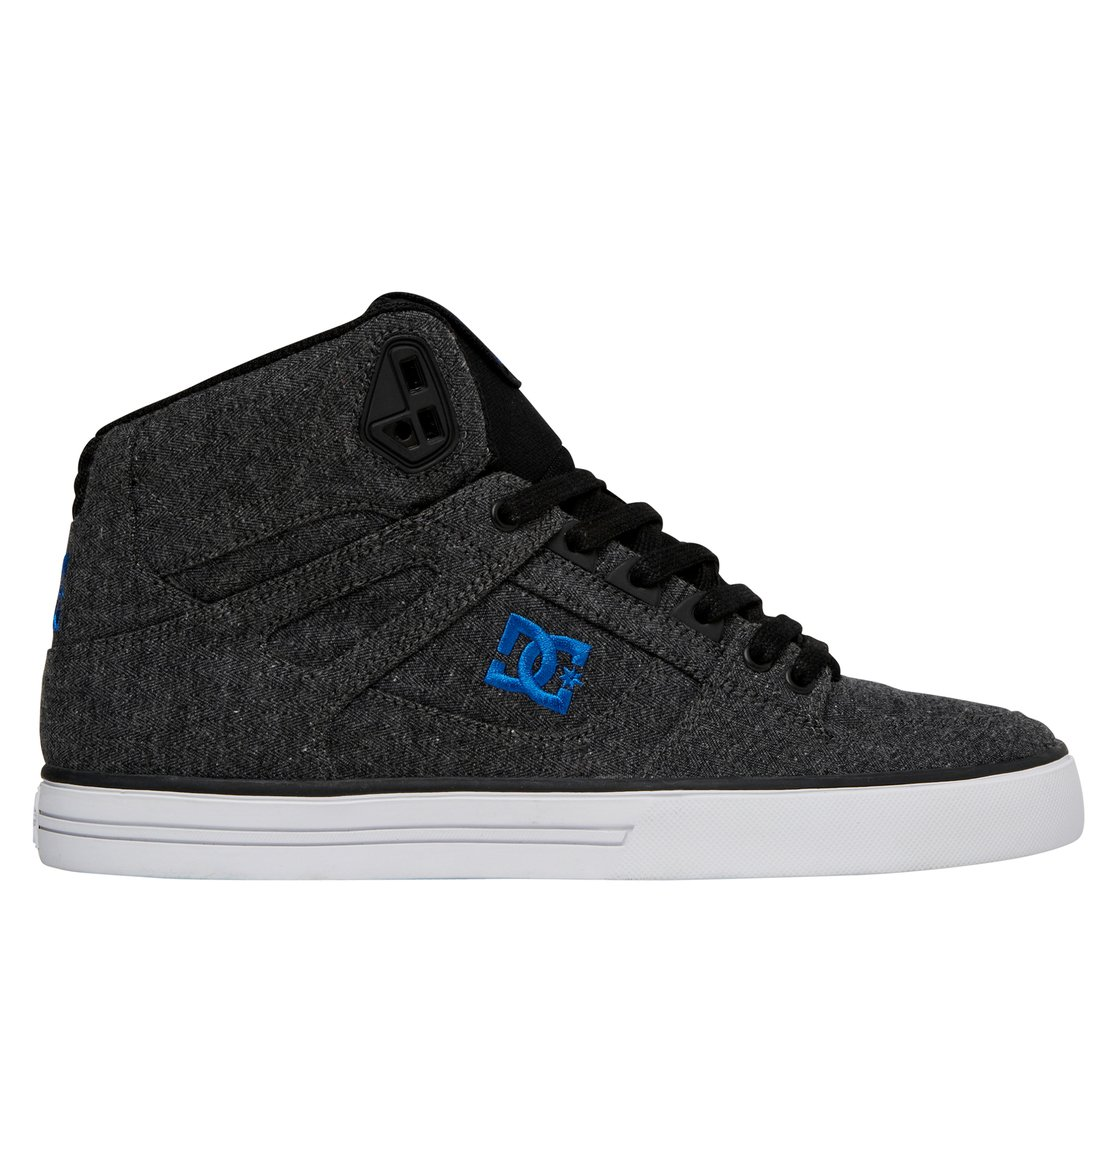 d3868b61bdbeb6 0 Spartan High WC TX SE High Top Shoes ADYS400004 DC Shoes